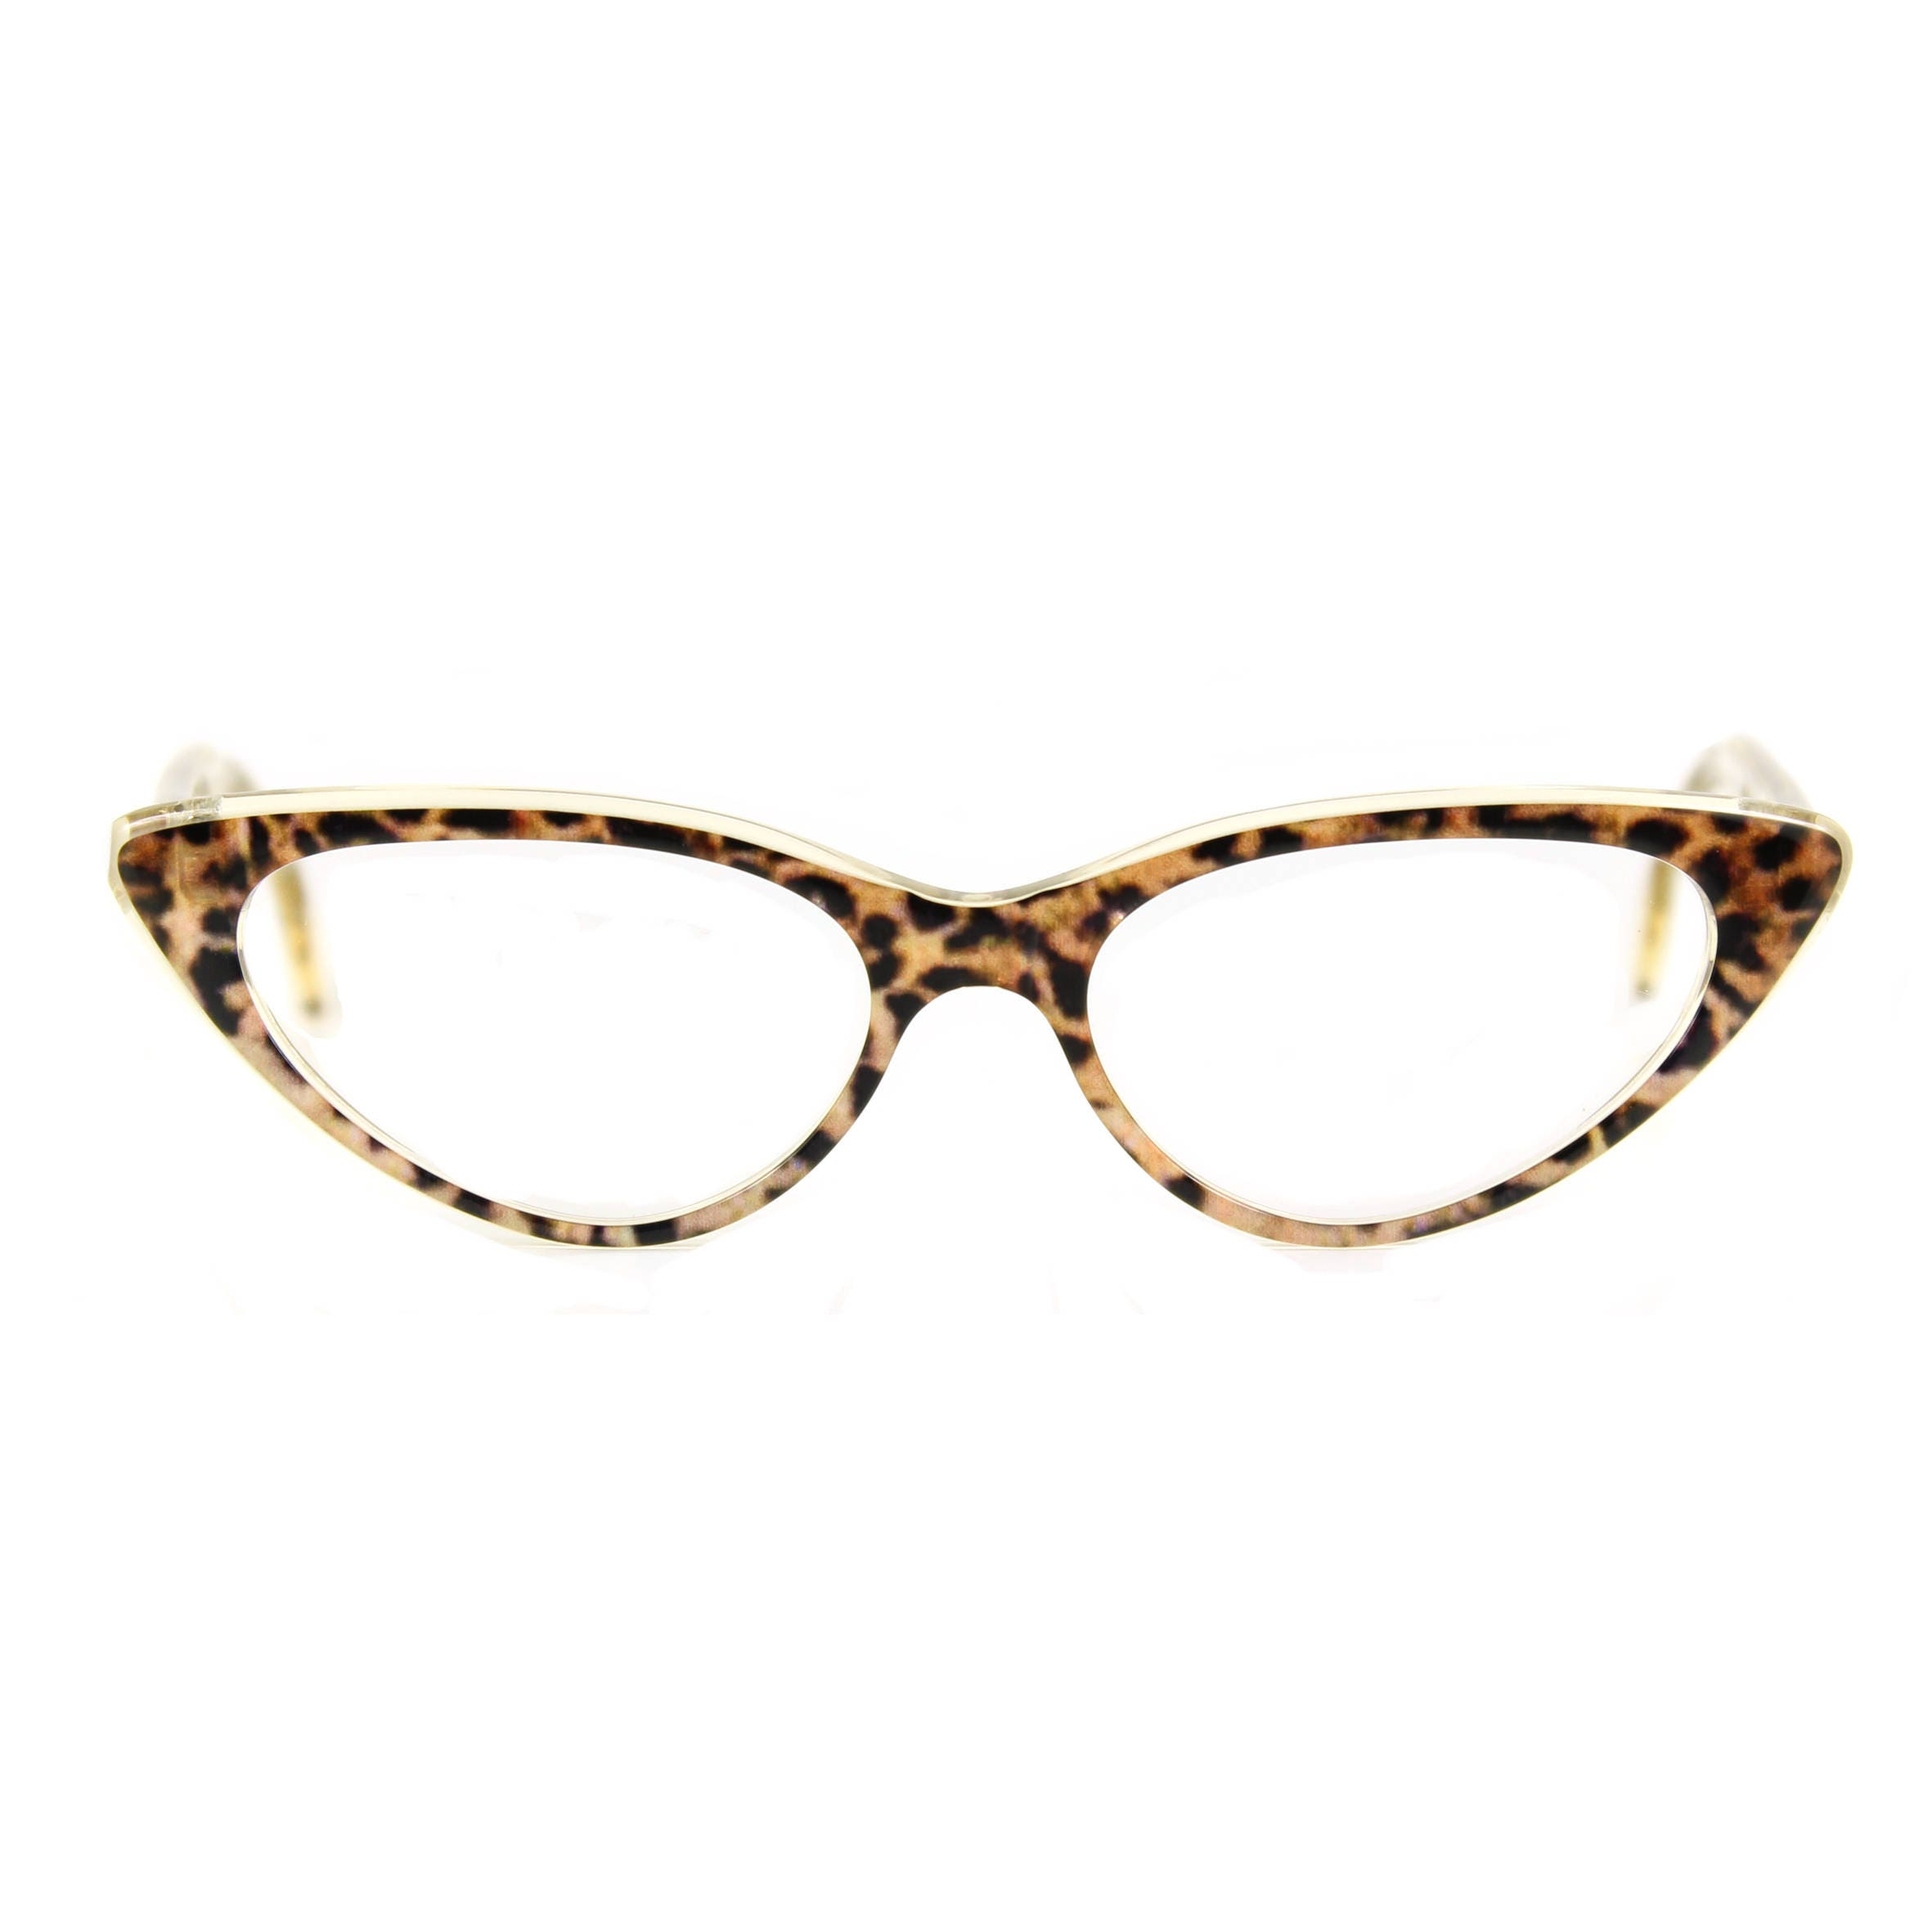 Katze-Brille schöne sexy große \'BARDOT\' \'Ozelot